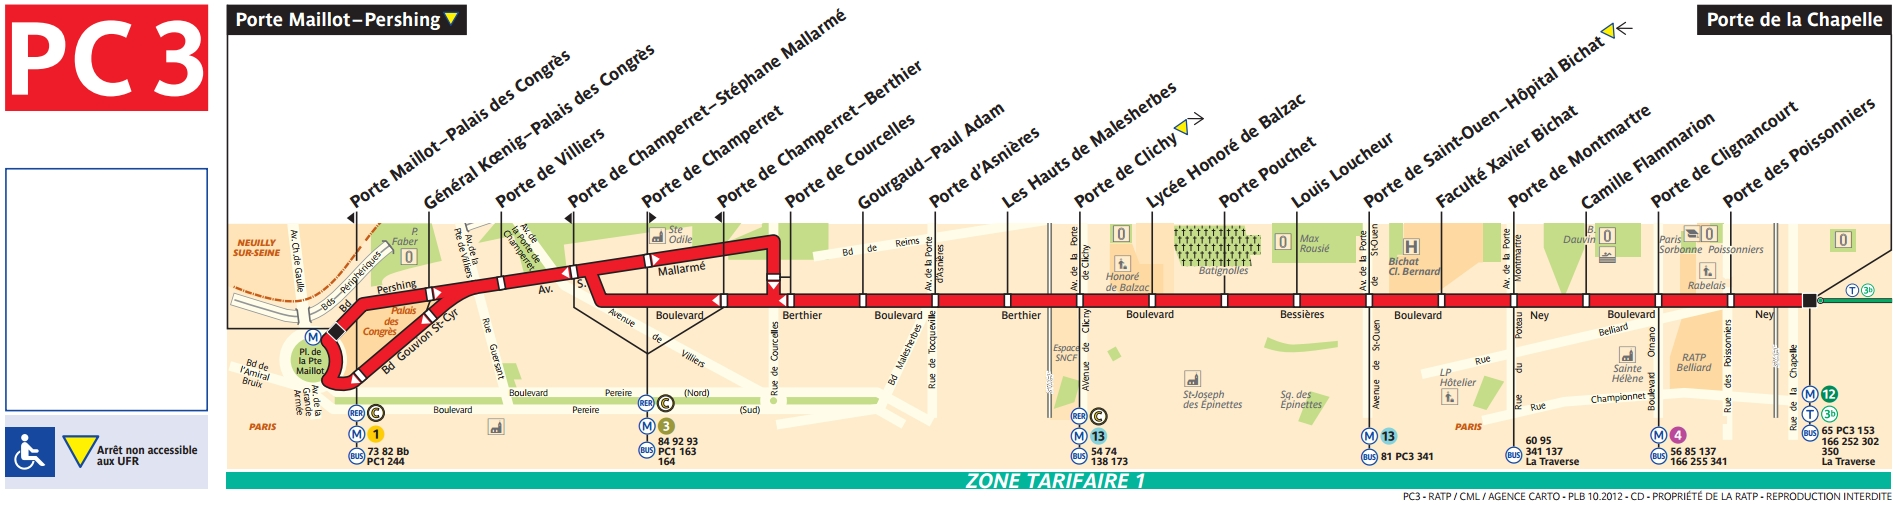 Plan bus Ligne PC3